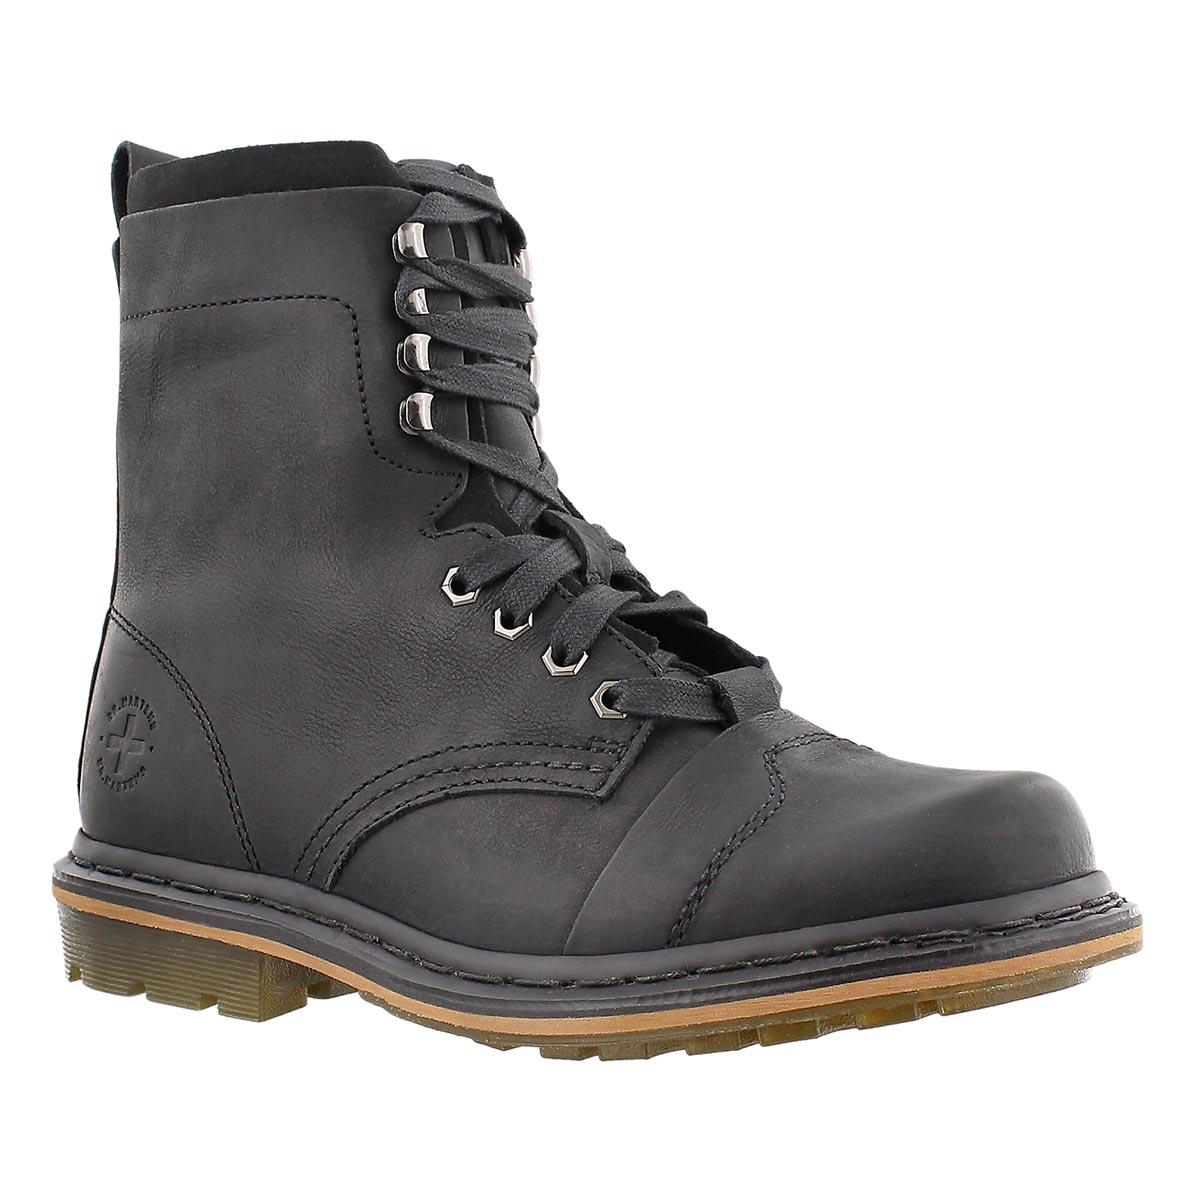 Mns Pier black 9 eye leather boot